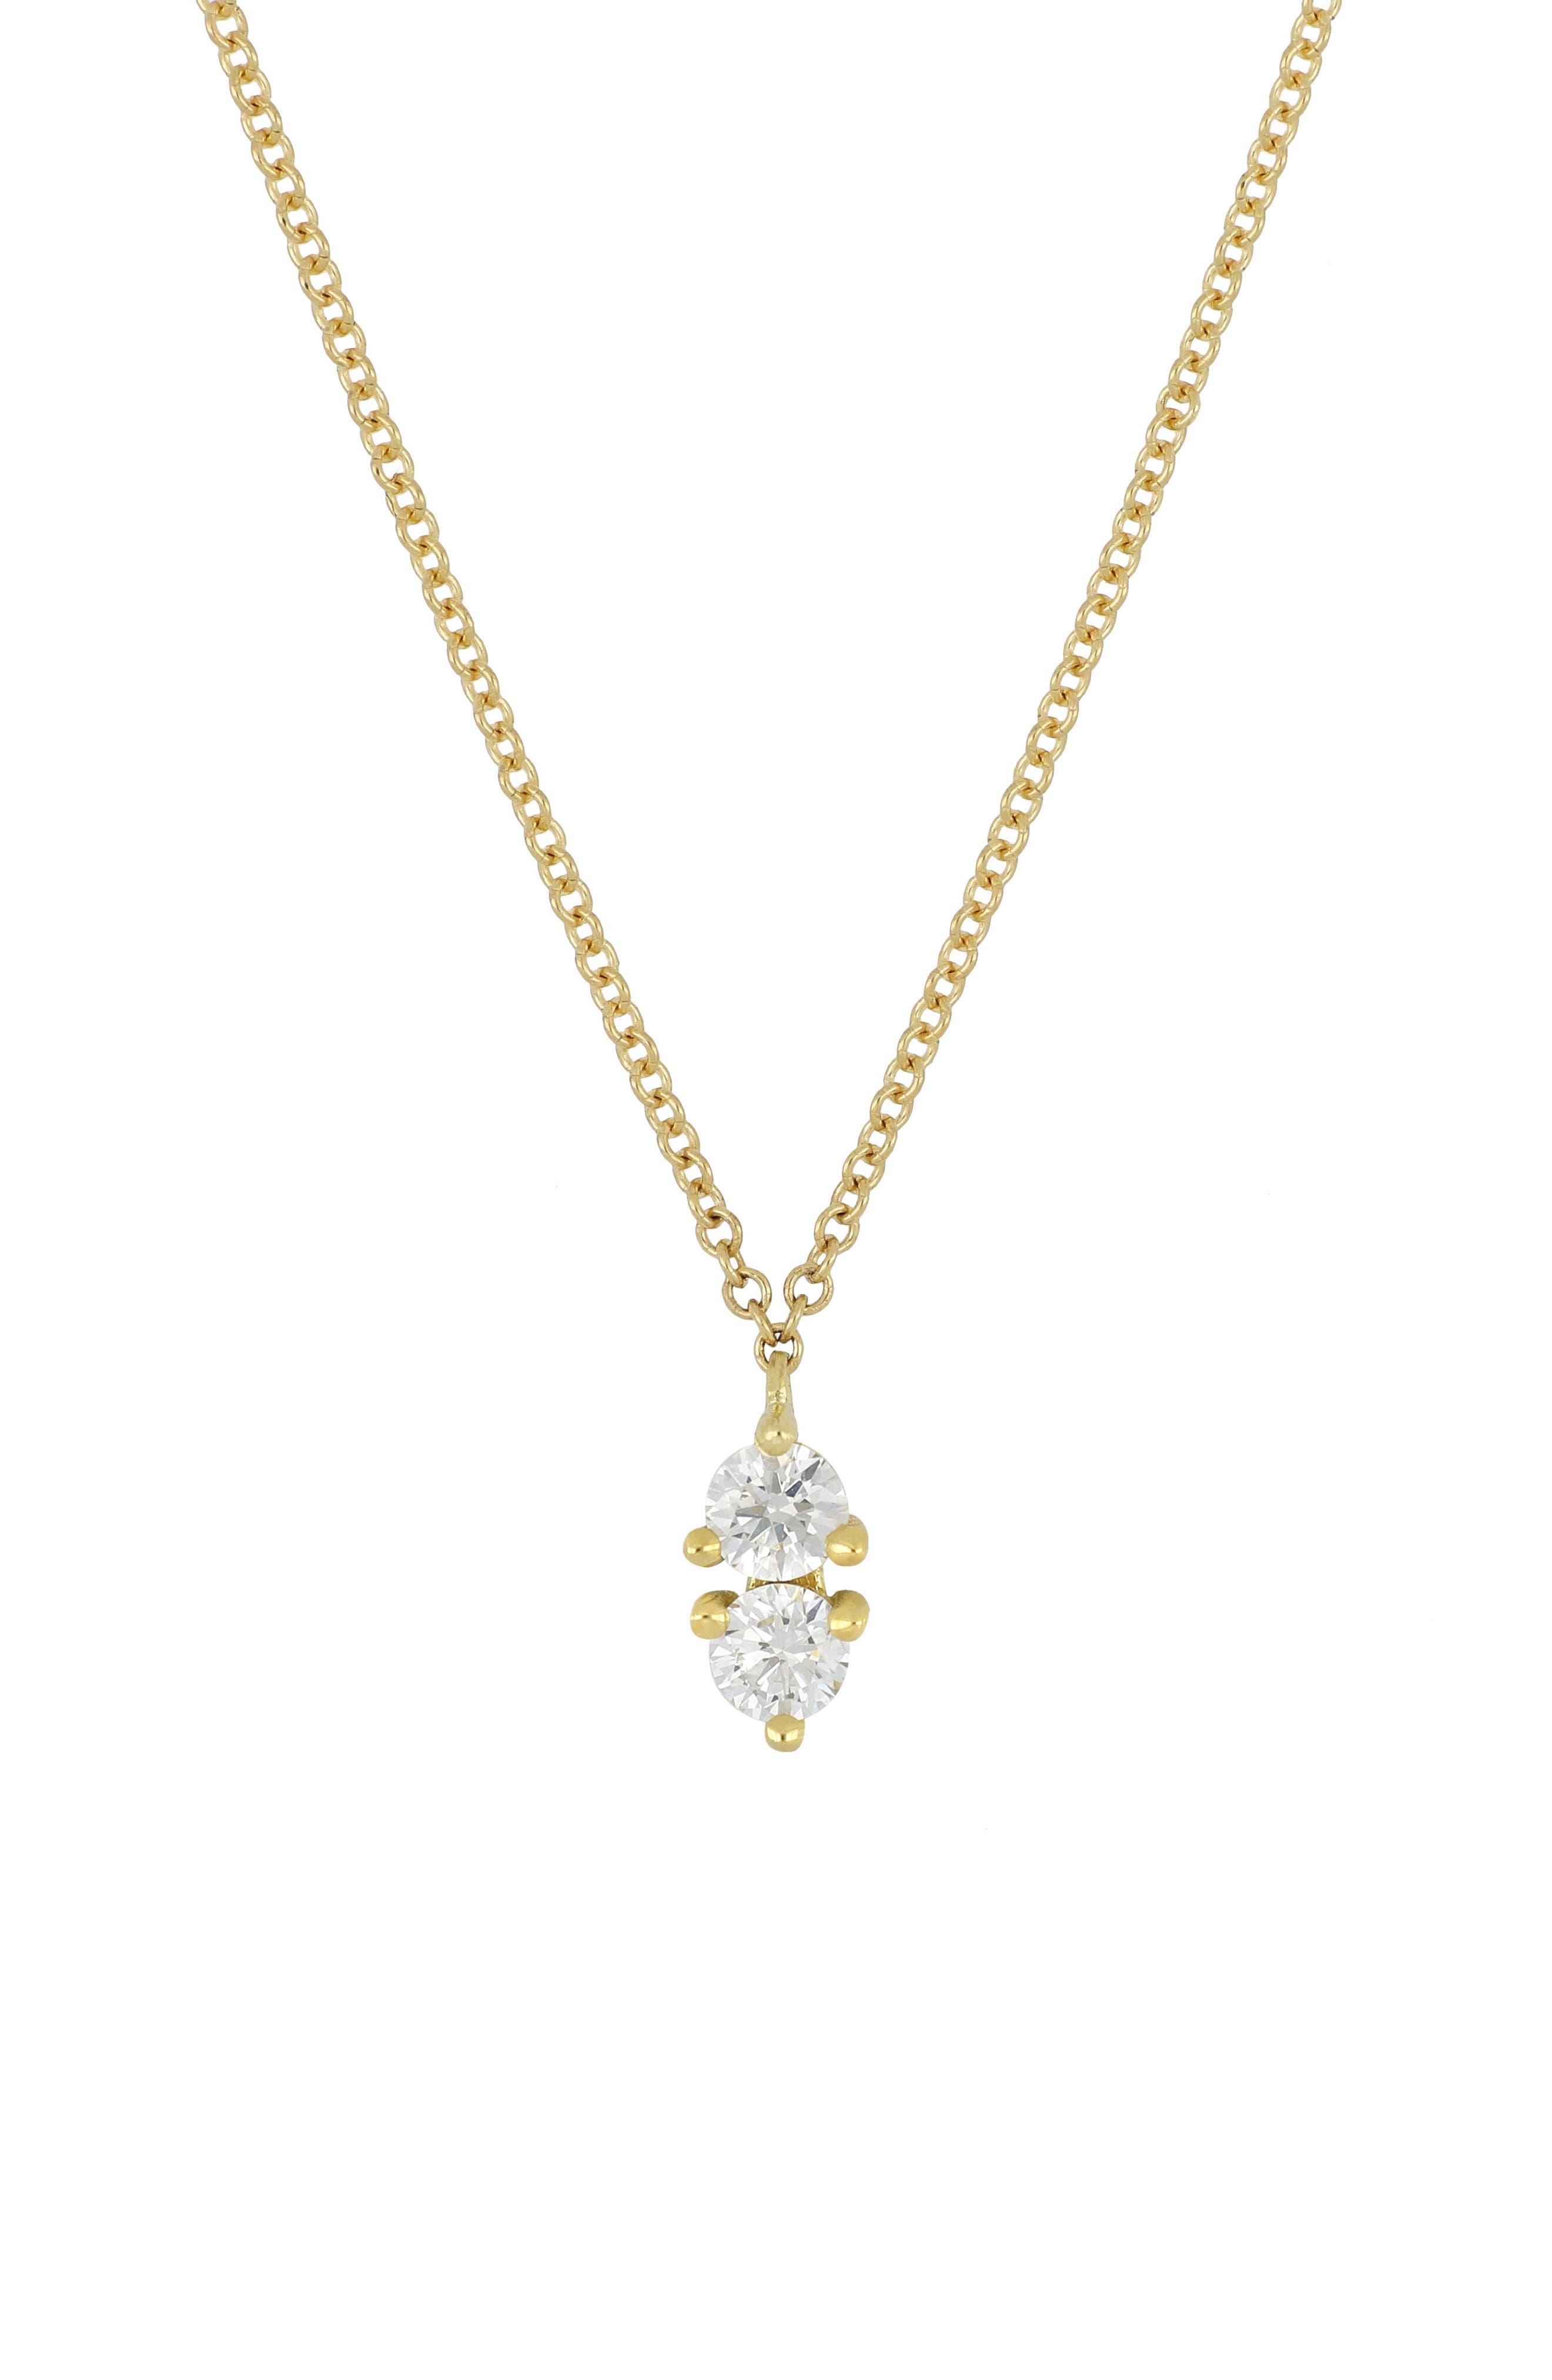 Birthstone Pendant Necklace,                             Main thumbnail 1, color,                             APRIL/ DIAMOND